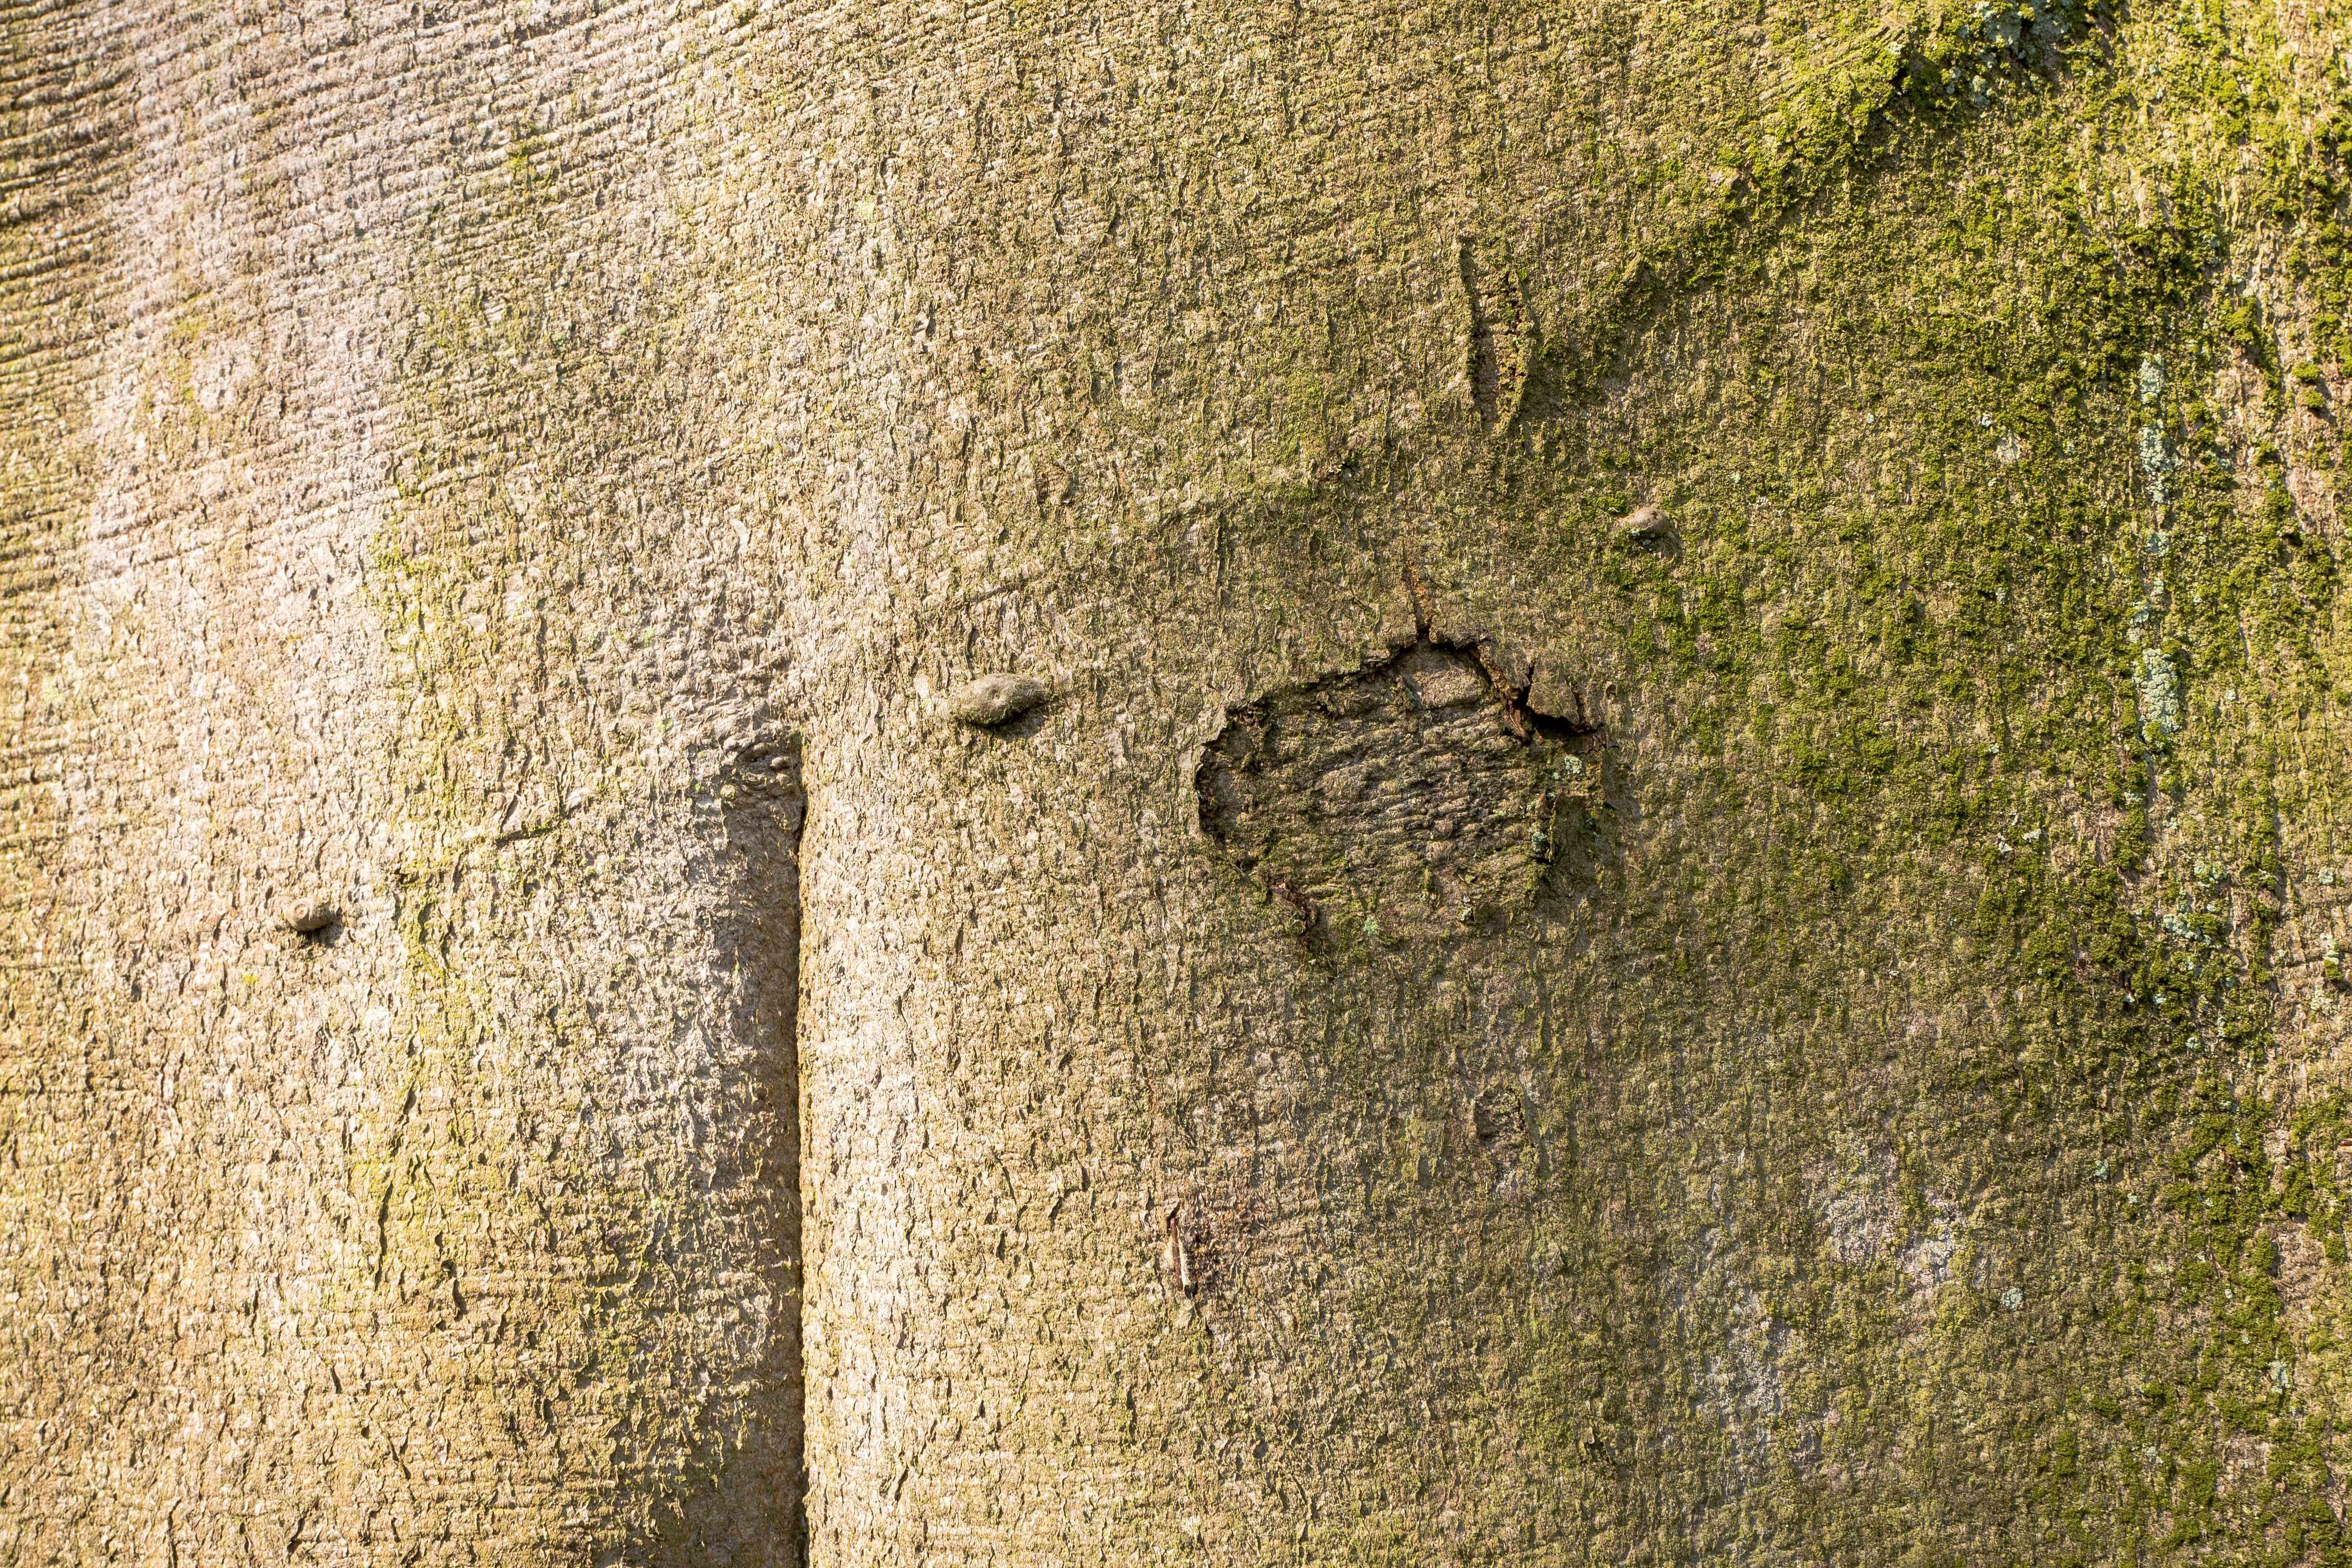 Close up of beech tree bark